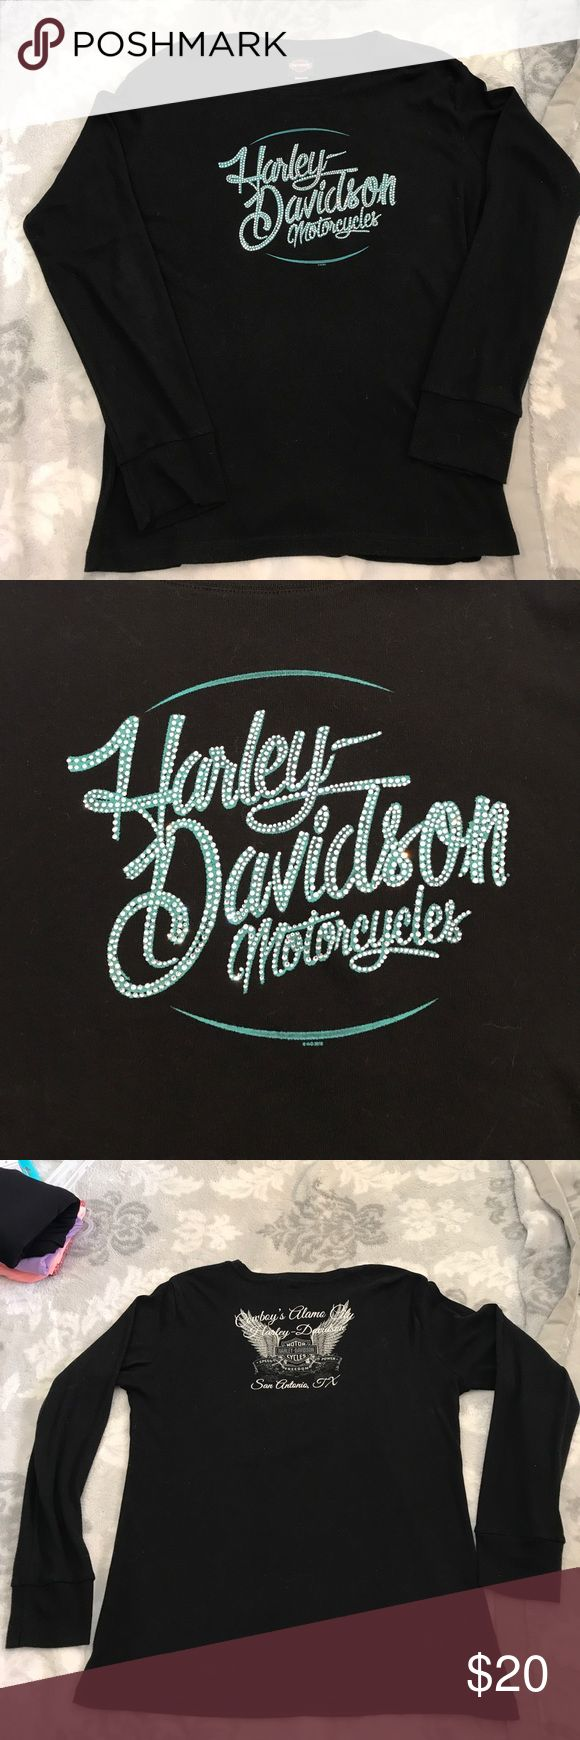 Harley Davidson Rhinestone Sweater Top Cowboys Alamo City San Antonio, TX on the back Harley-Davidson Tops Tees - Long Sleeve